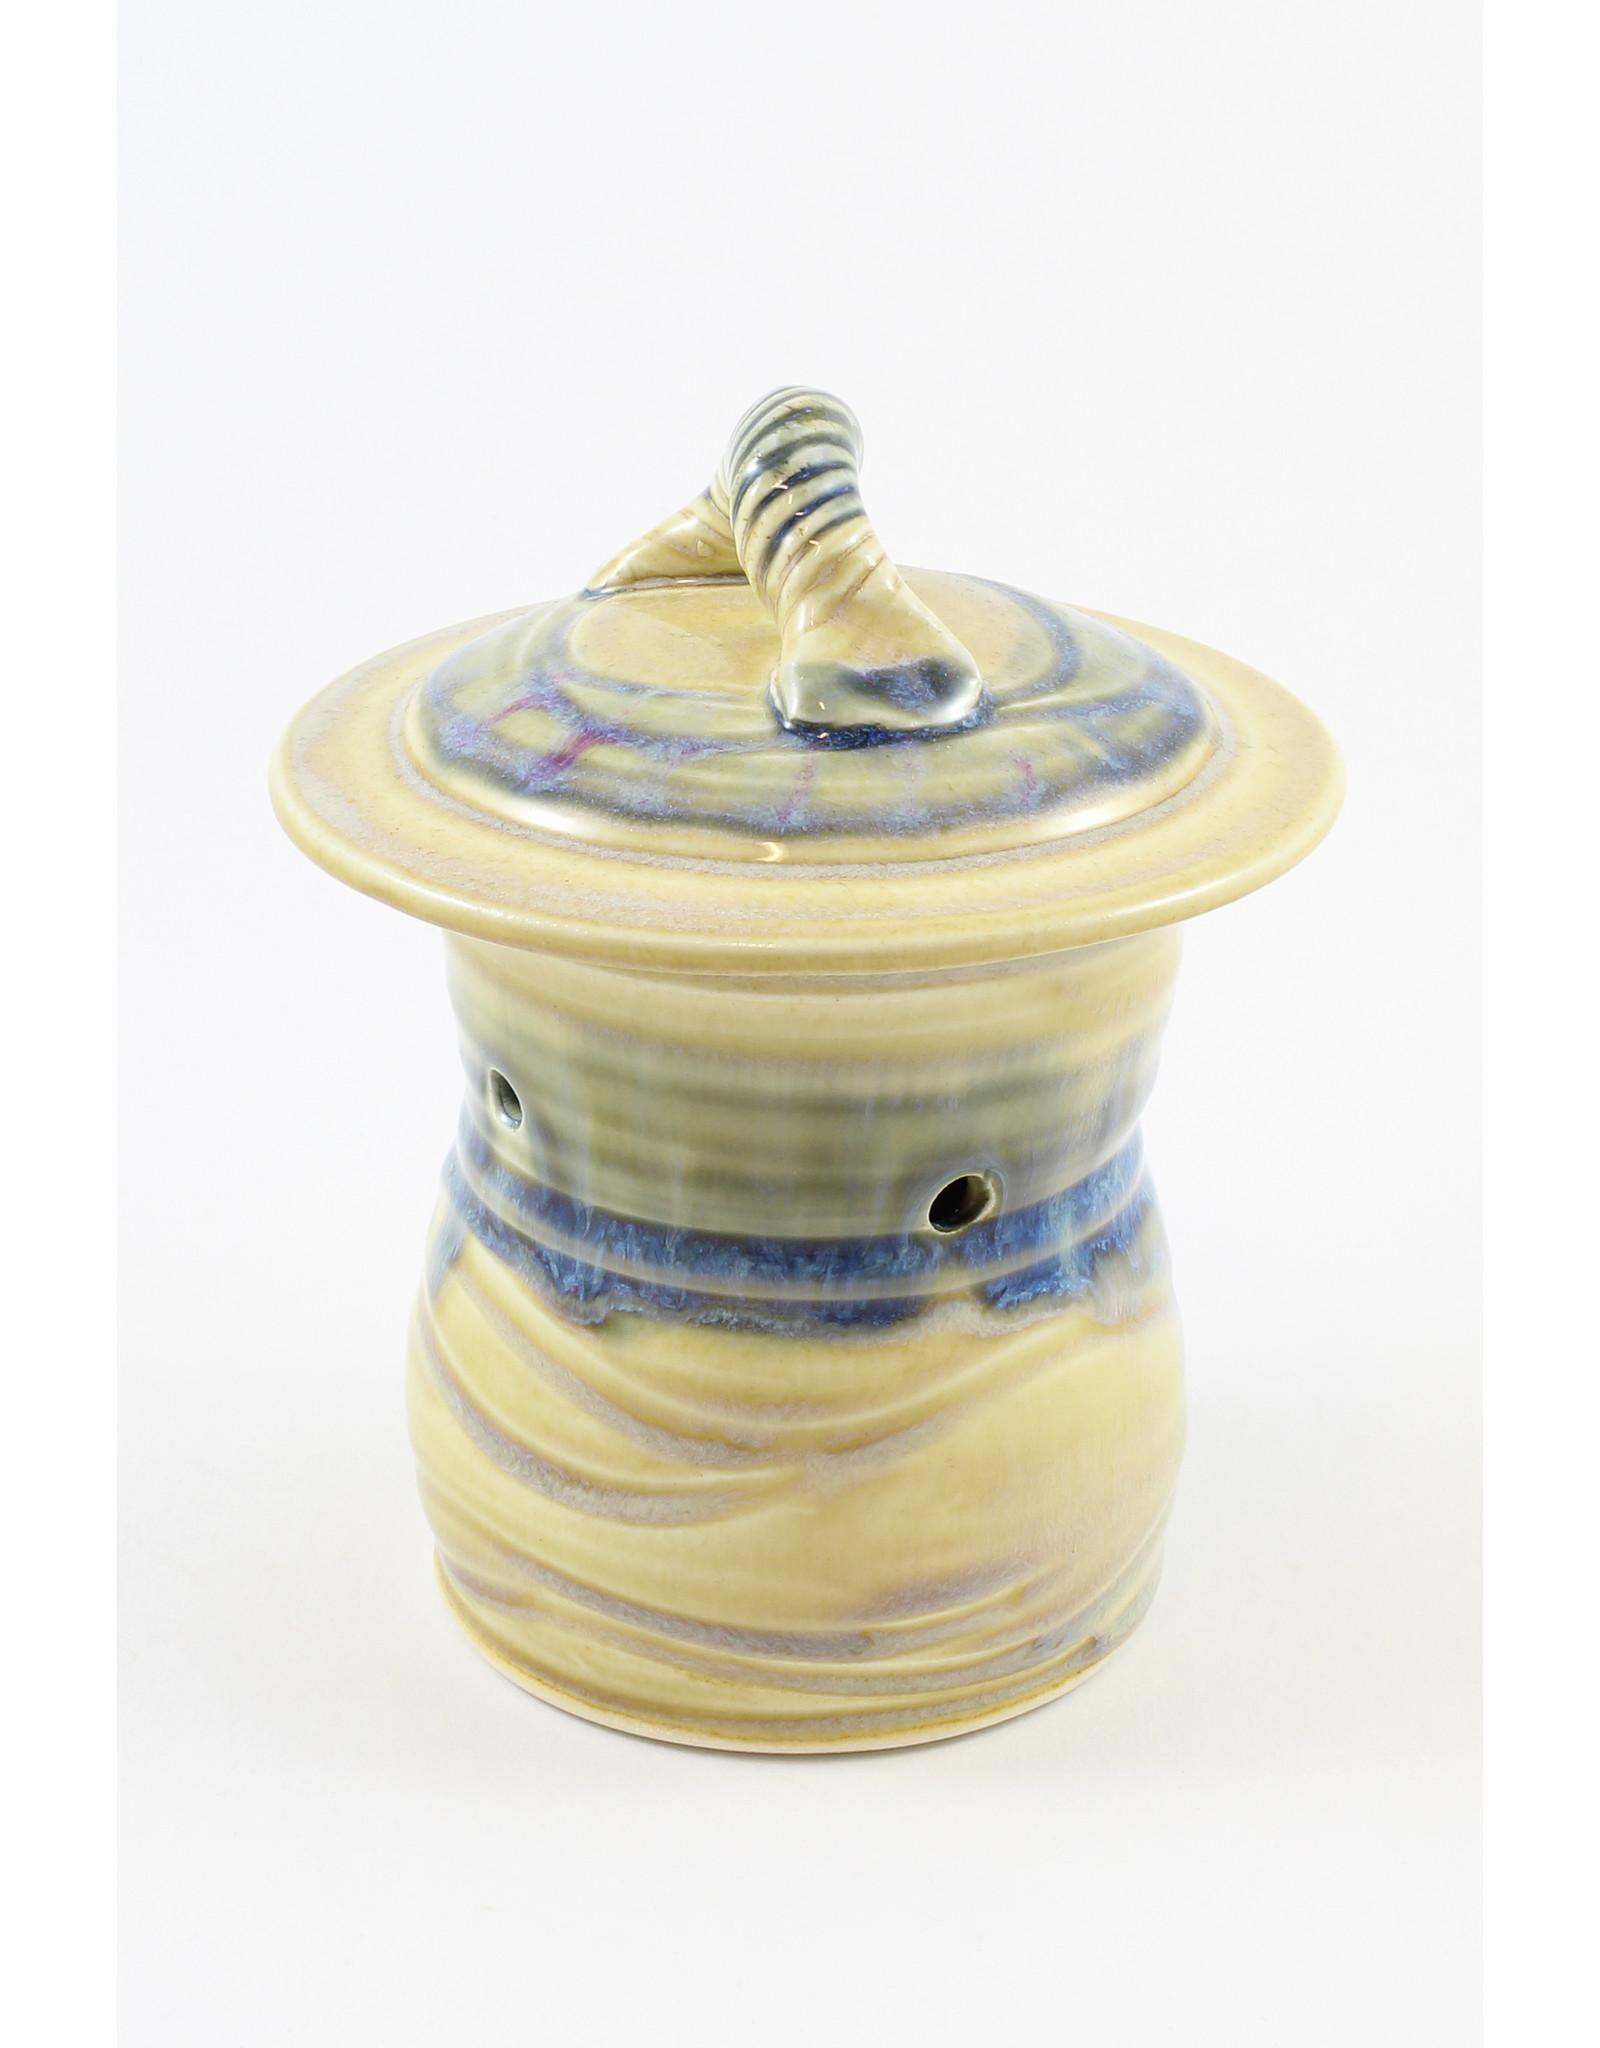 Linda Wright Garlic Keepers by Linda Wright